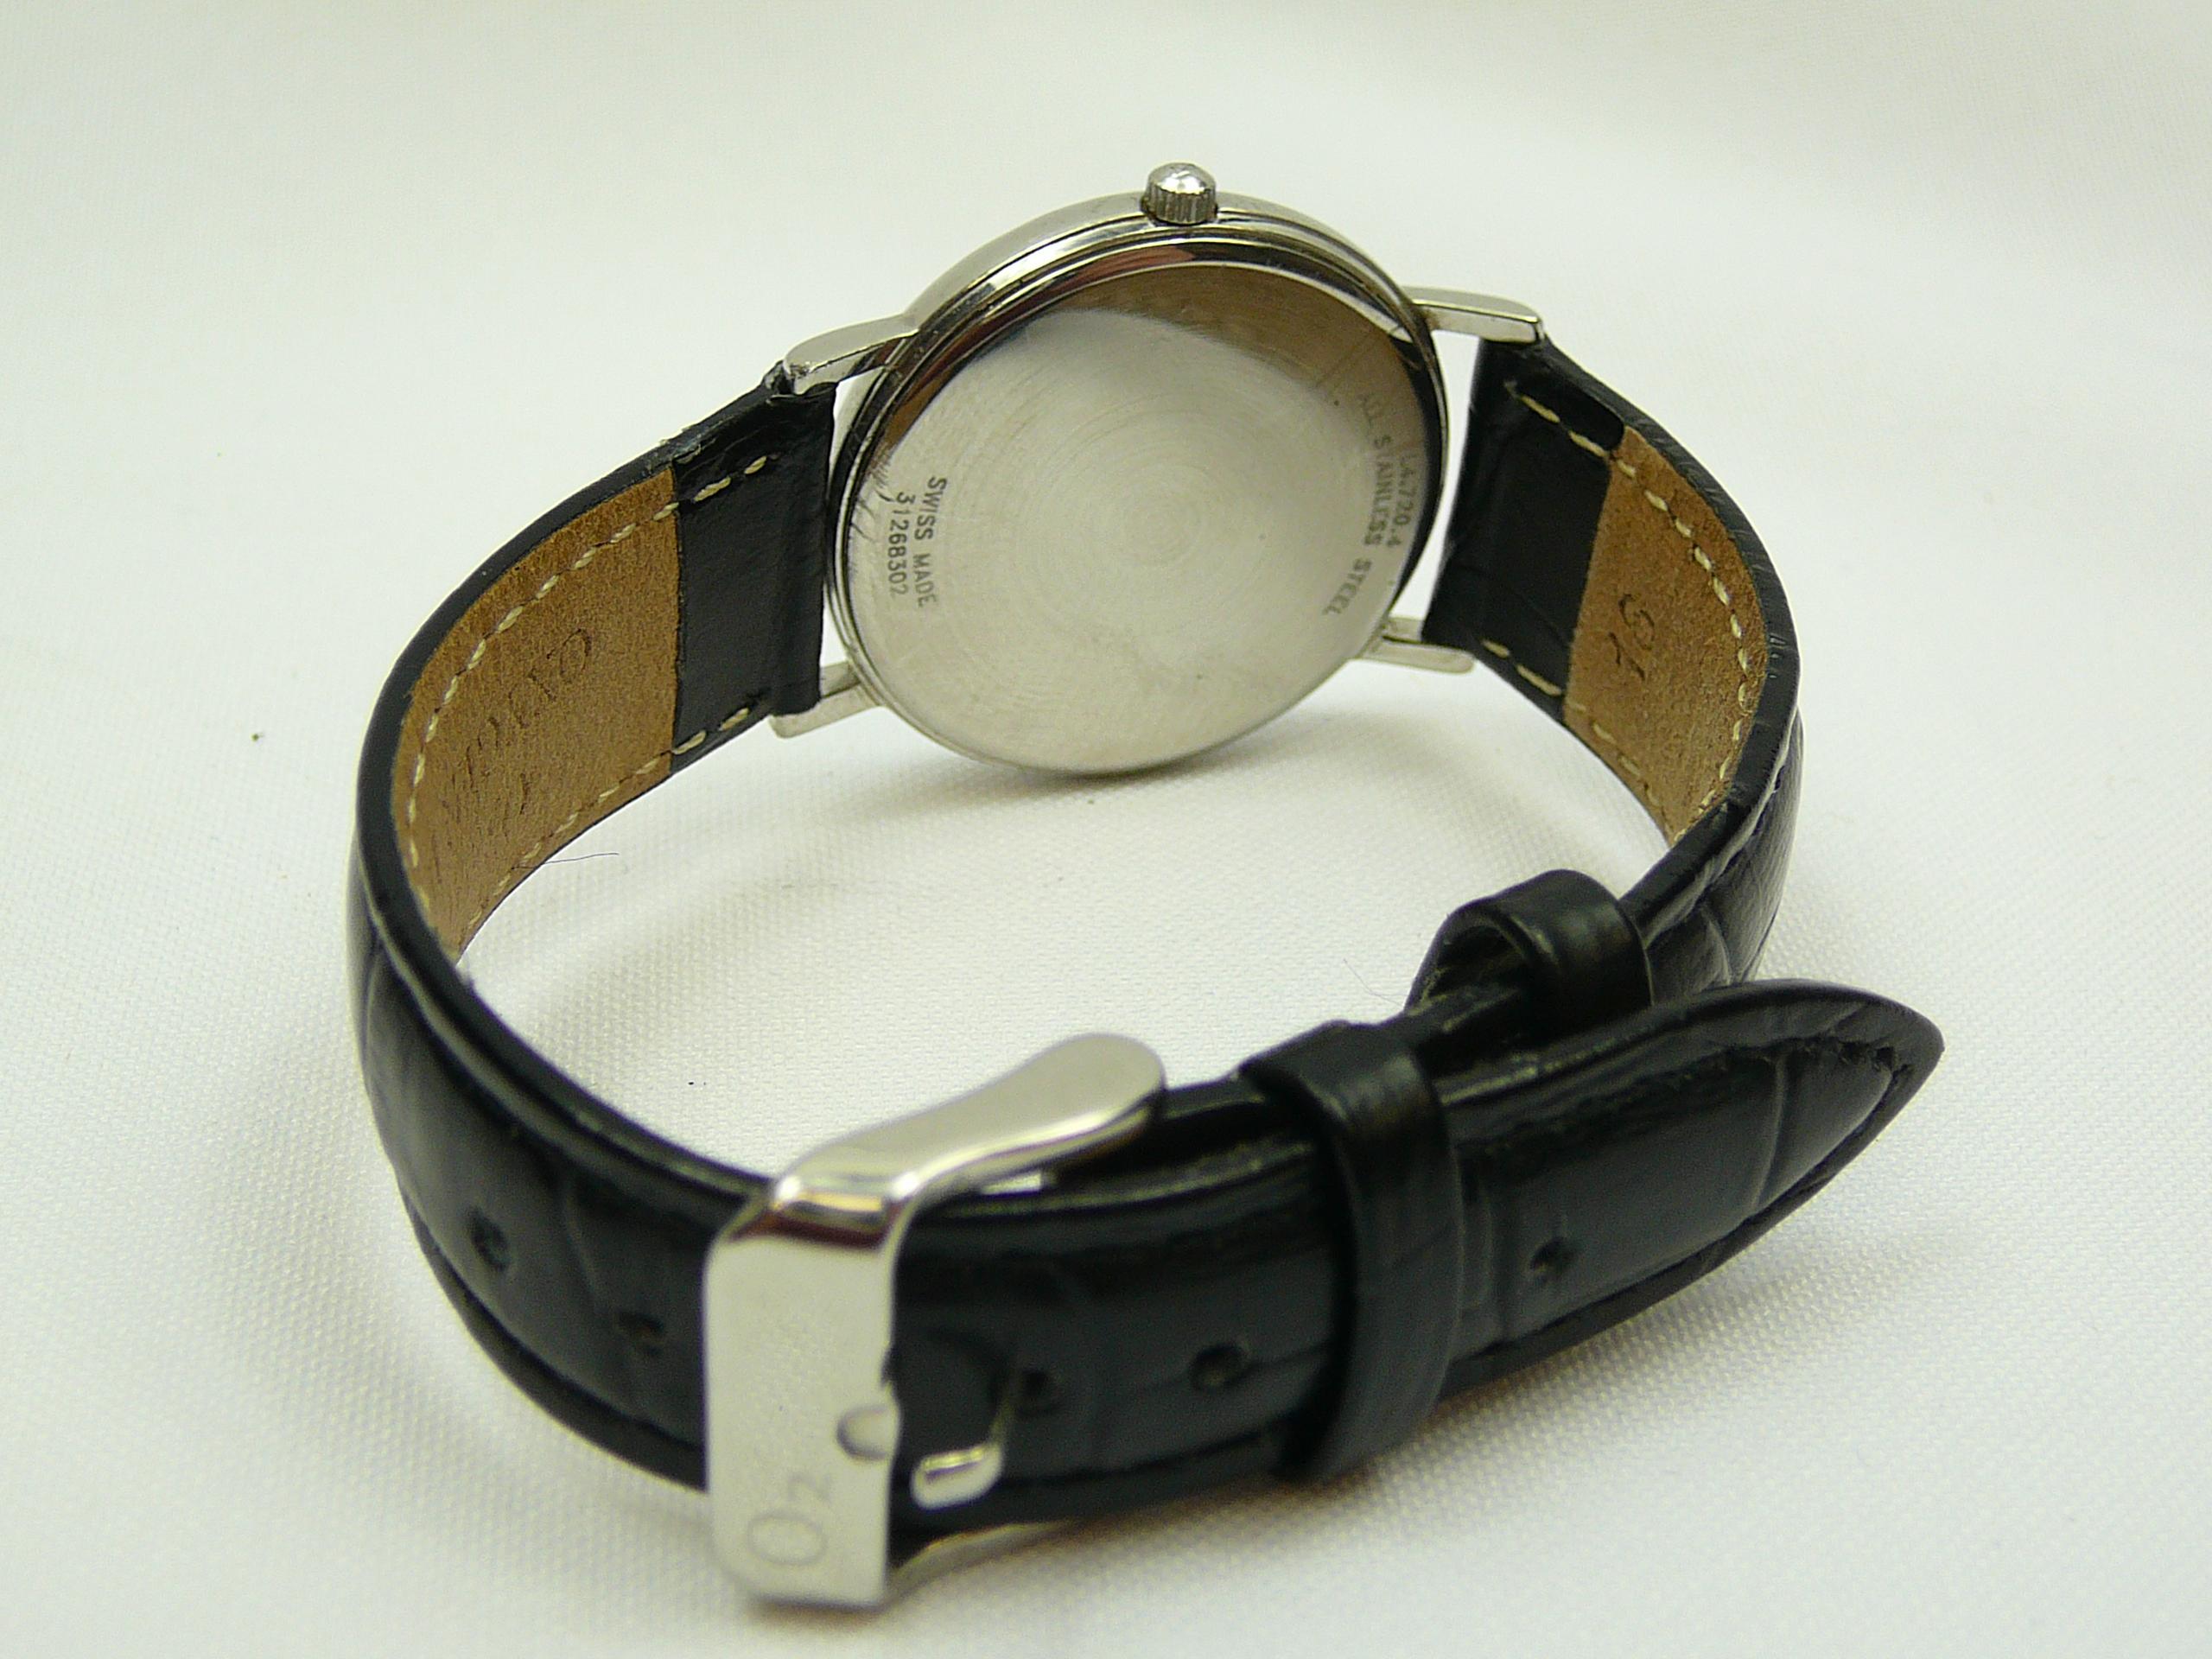 Gents Longines Wrist Watch - Image 3 of 3